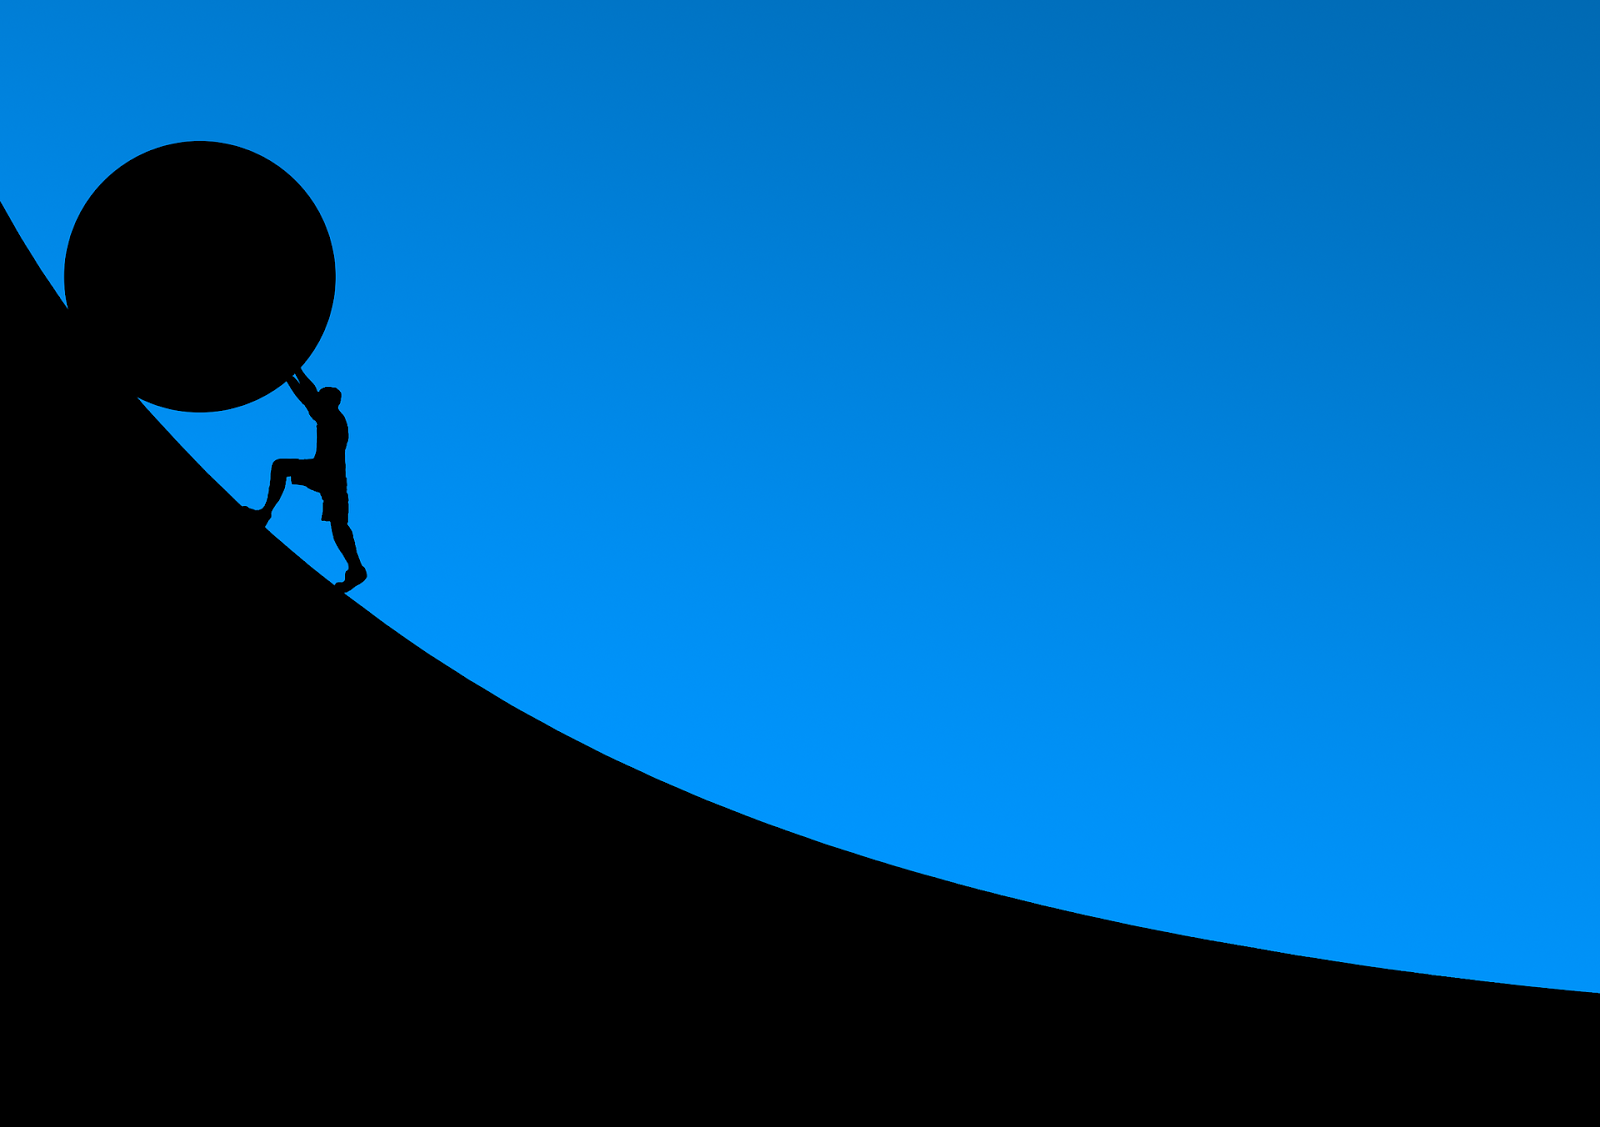 50 सक्सेस टिप्स - Best Motivational Tips in Hindi